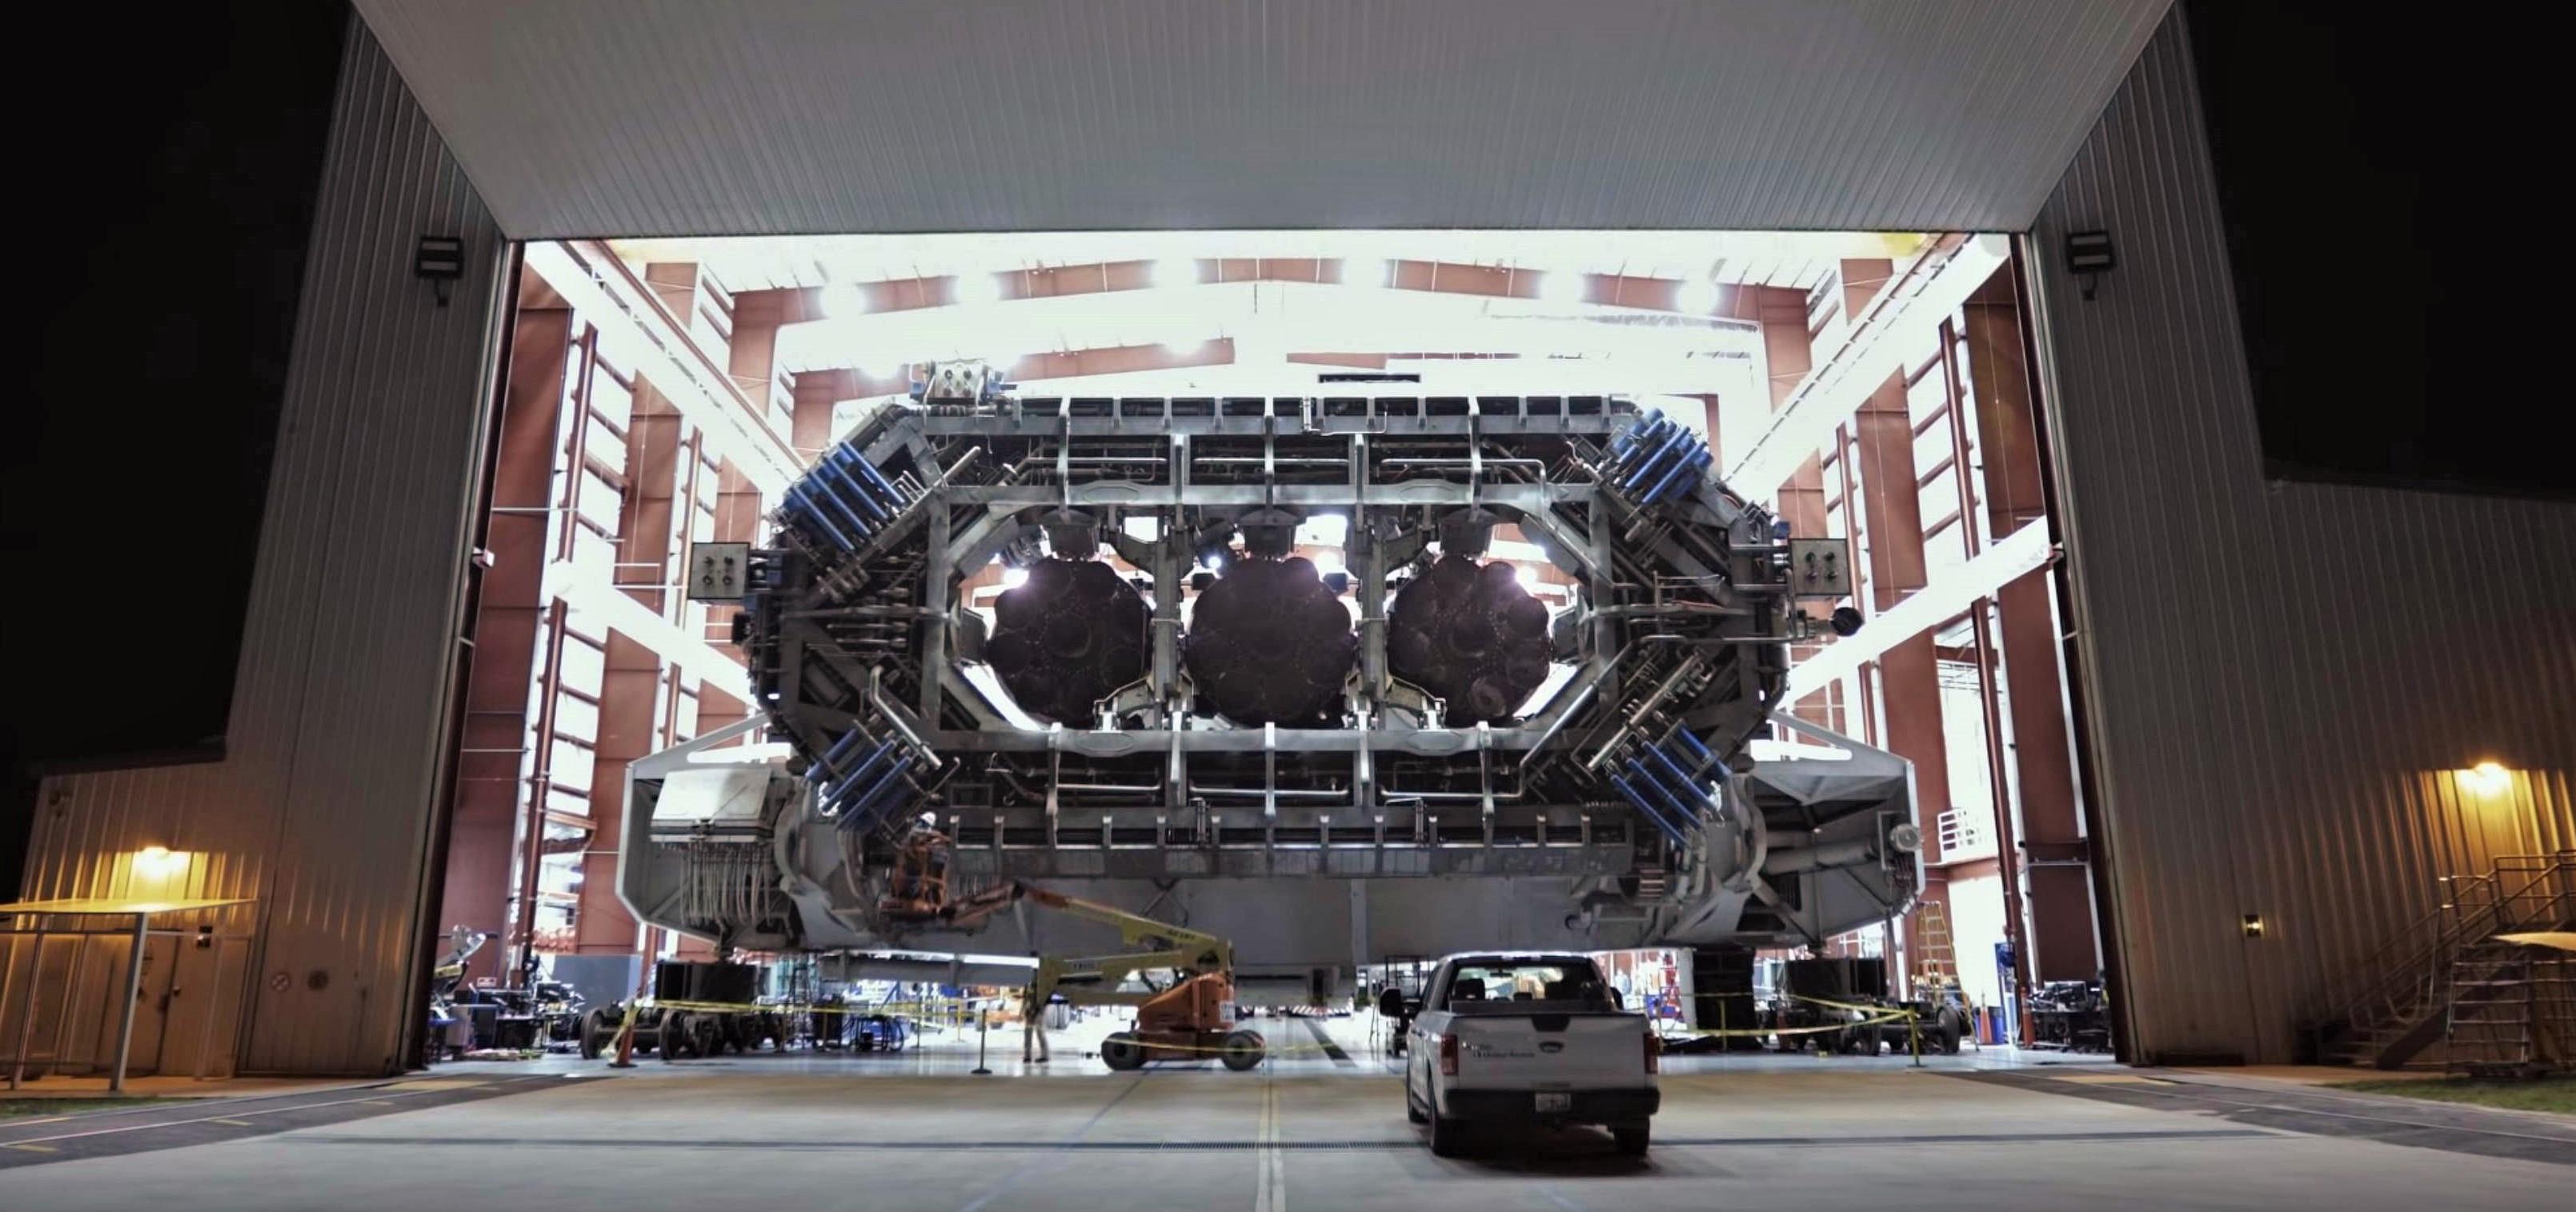 Falcon Heavy Flight 1 TE hangar rollout (SpaceX) 1 edit